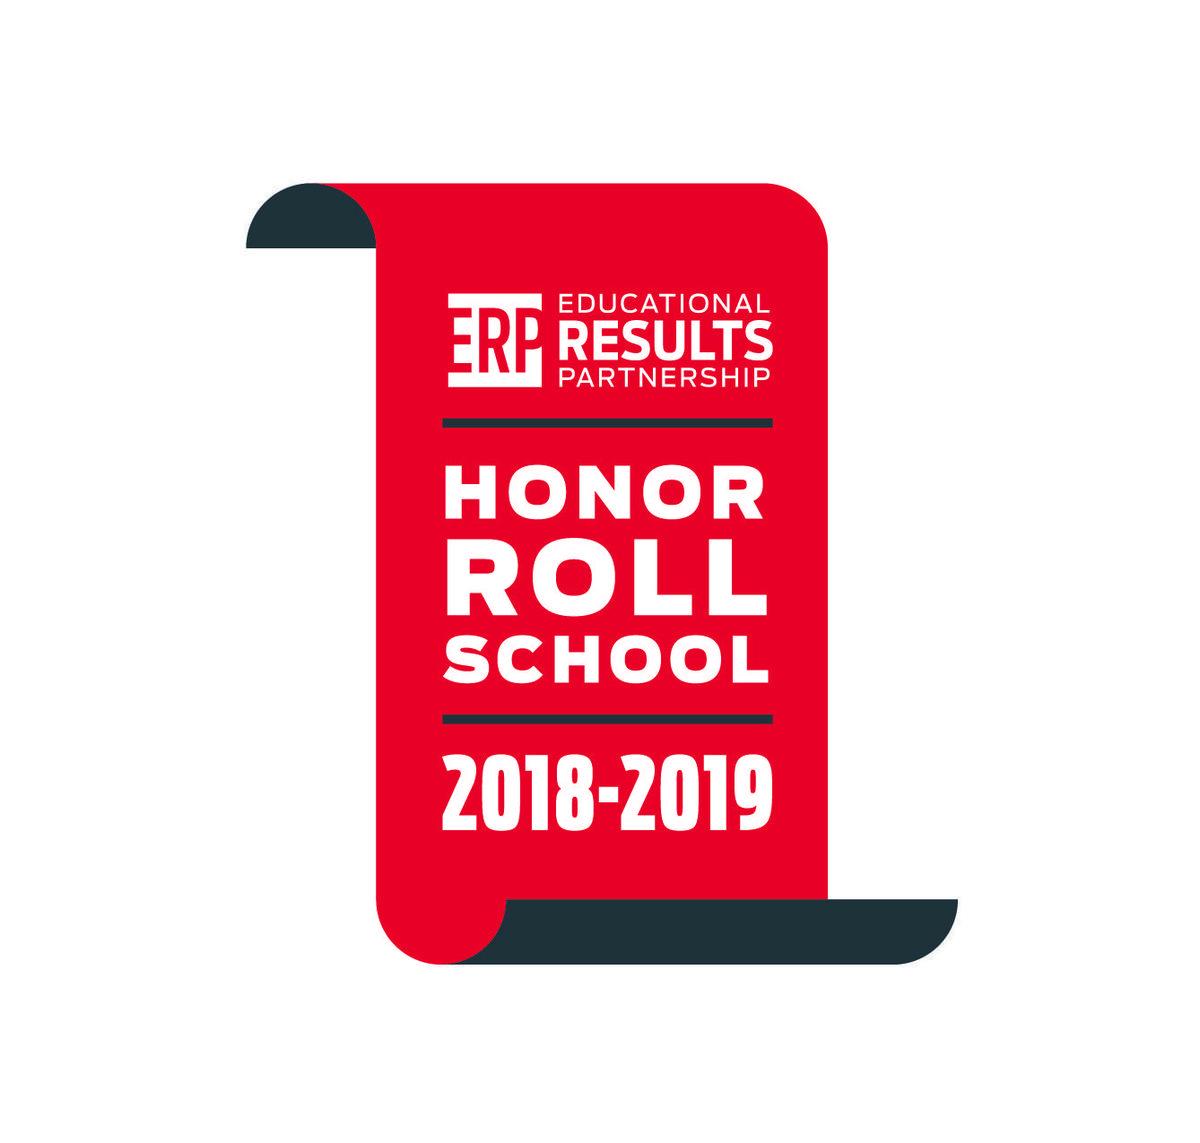 Honor Roll School 2018-2019